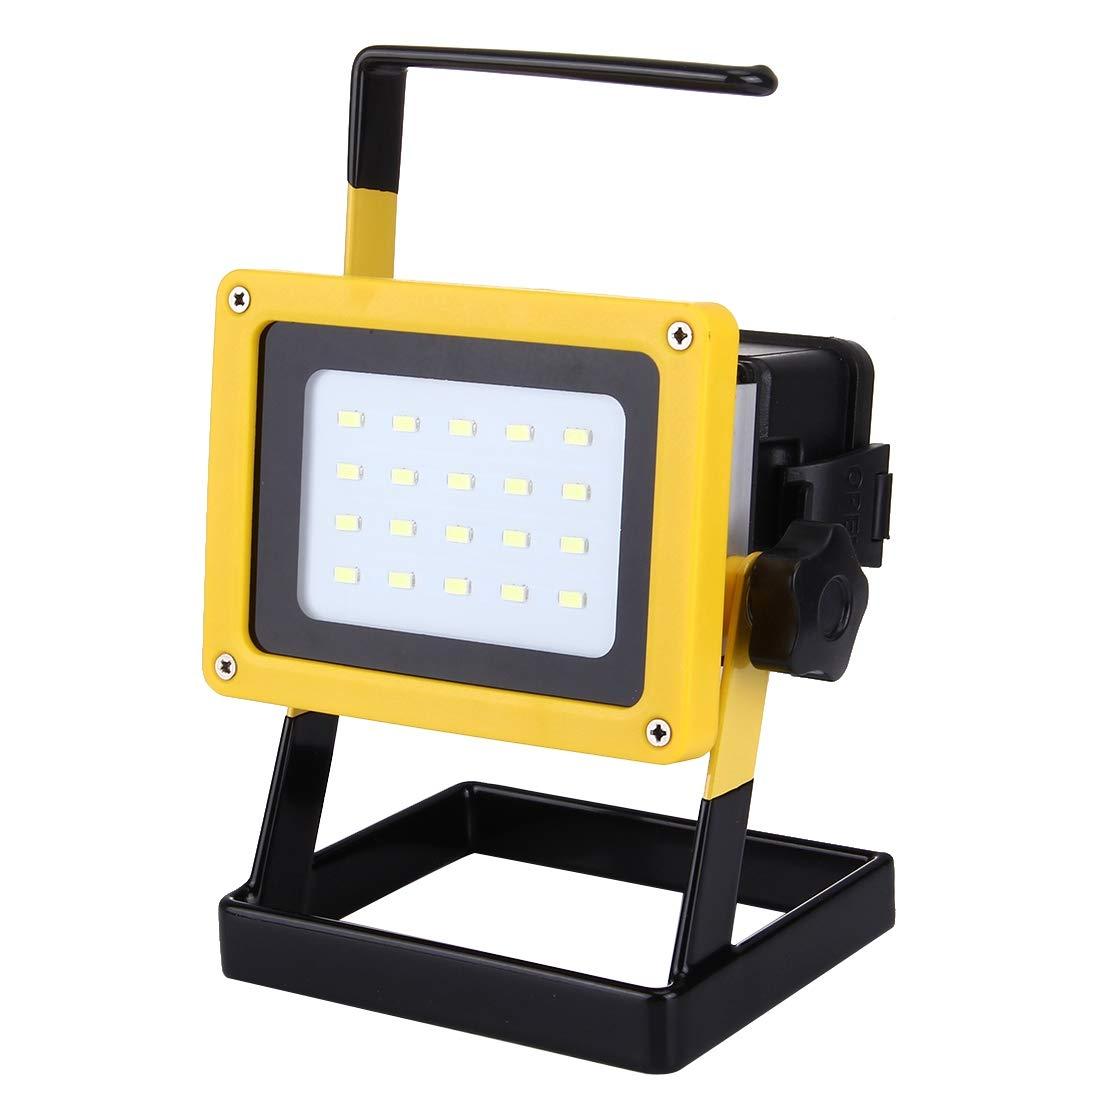 Ouyingmatealliance LED Light GuoBo LED-Licht 35W 2640LM Hochleistungs-Handheld-LED-Zusatzlicht, 20 LED 3ATM wasserdicht, tragbar, 110-240 V (weißes Licht)